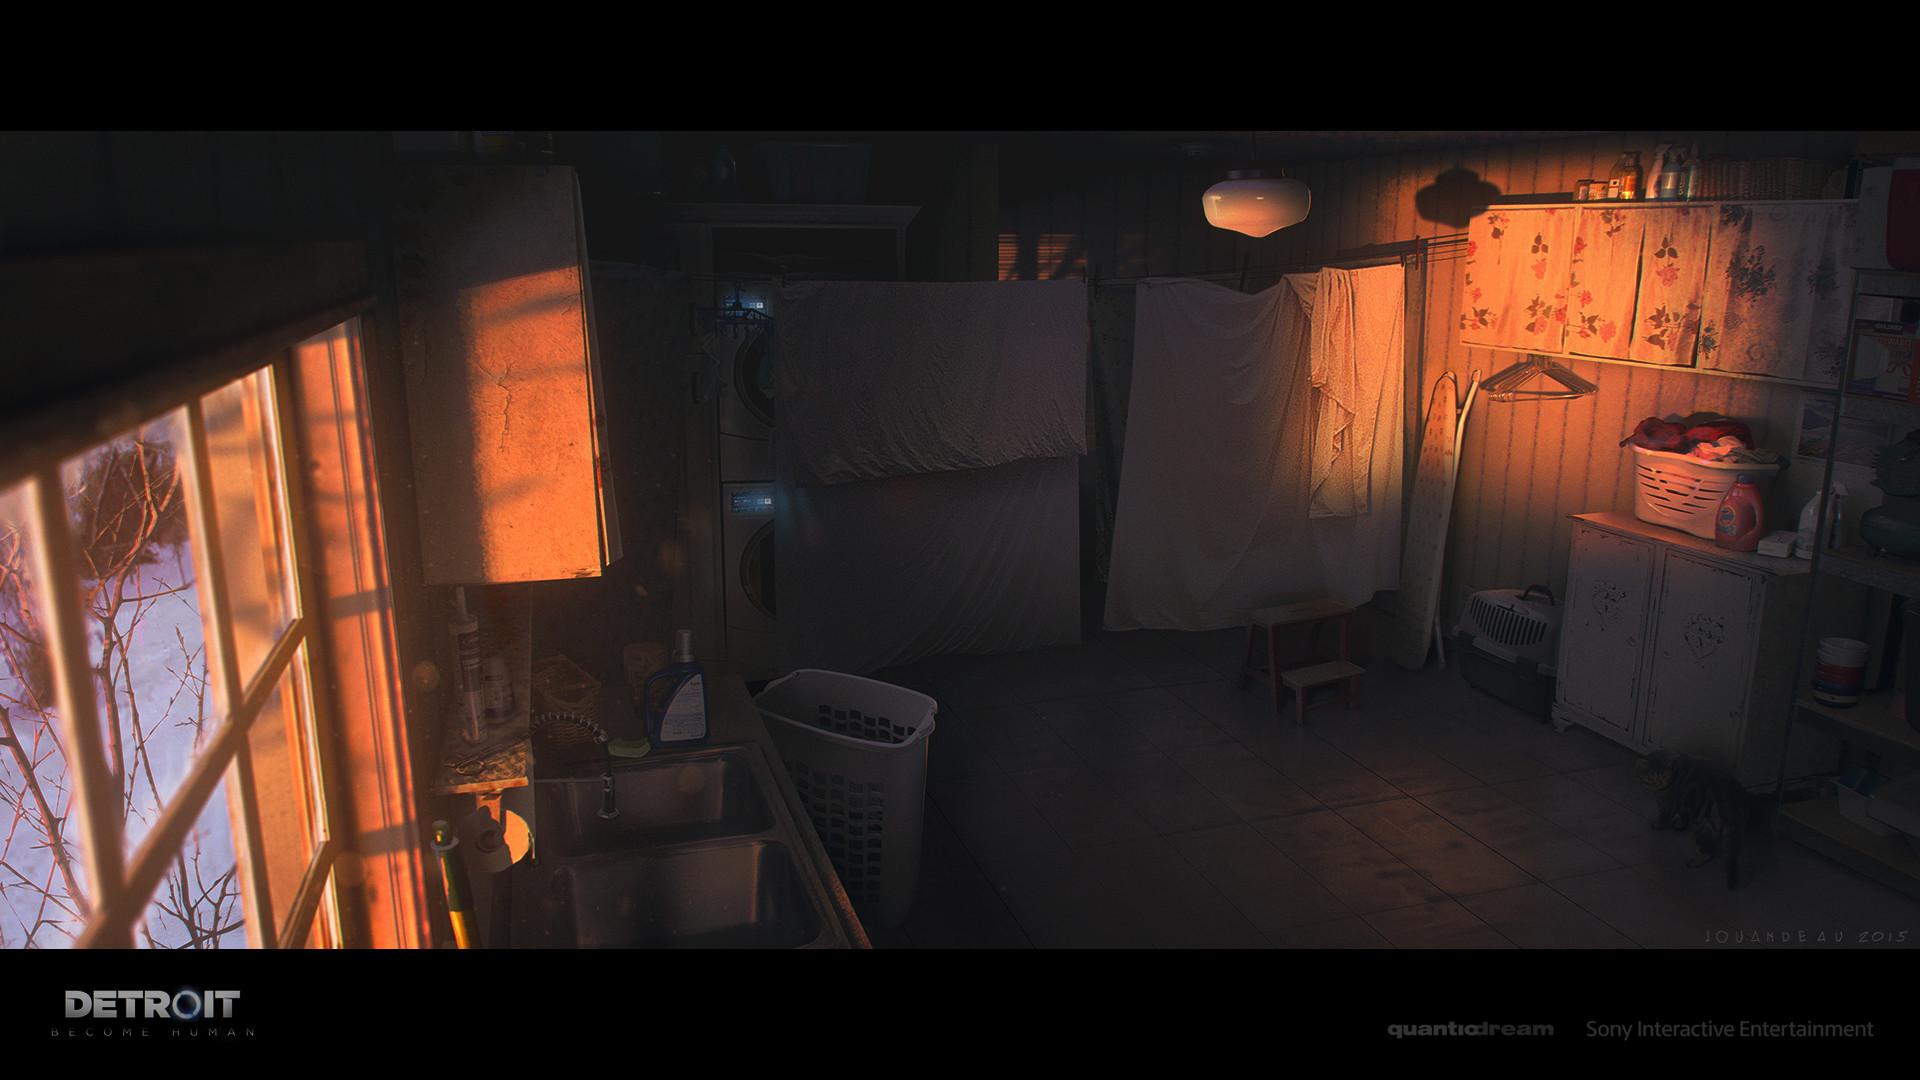 Romain jouandeau decor act ii s08k kara a place to hide utility room v04